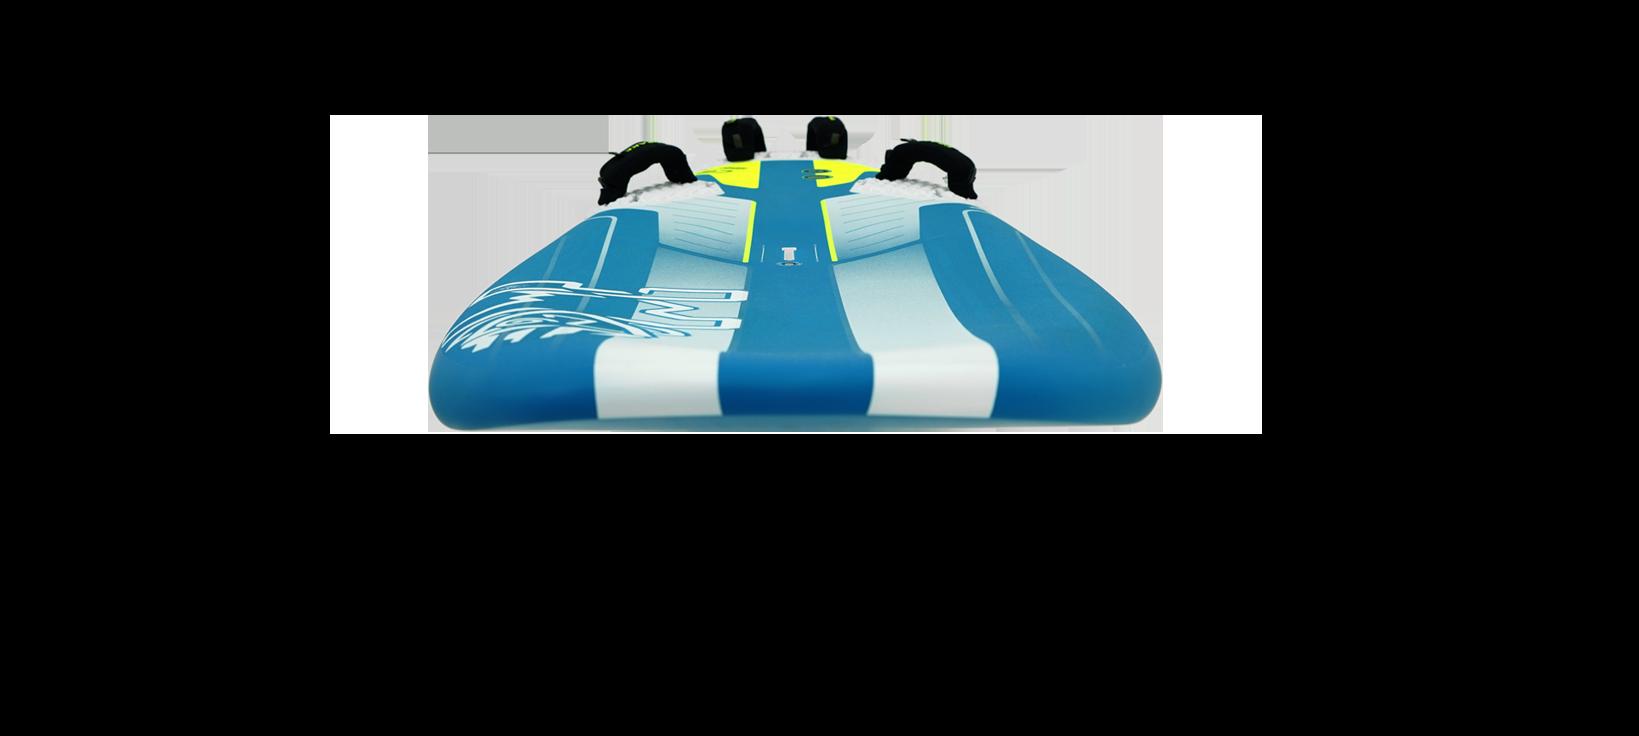 Winner Of The CARVE Giveaway  - 2 - Windsurf